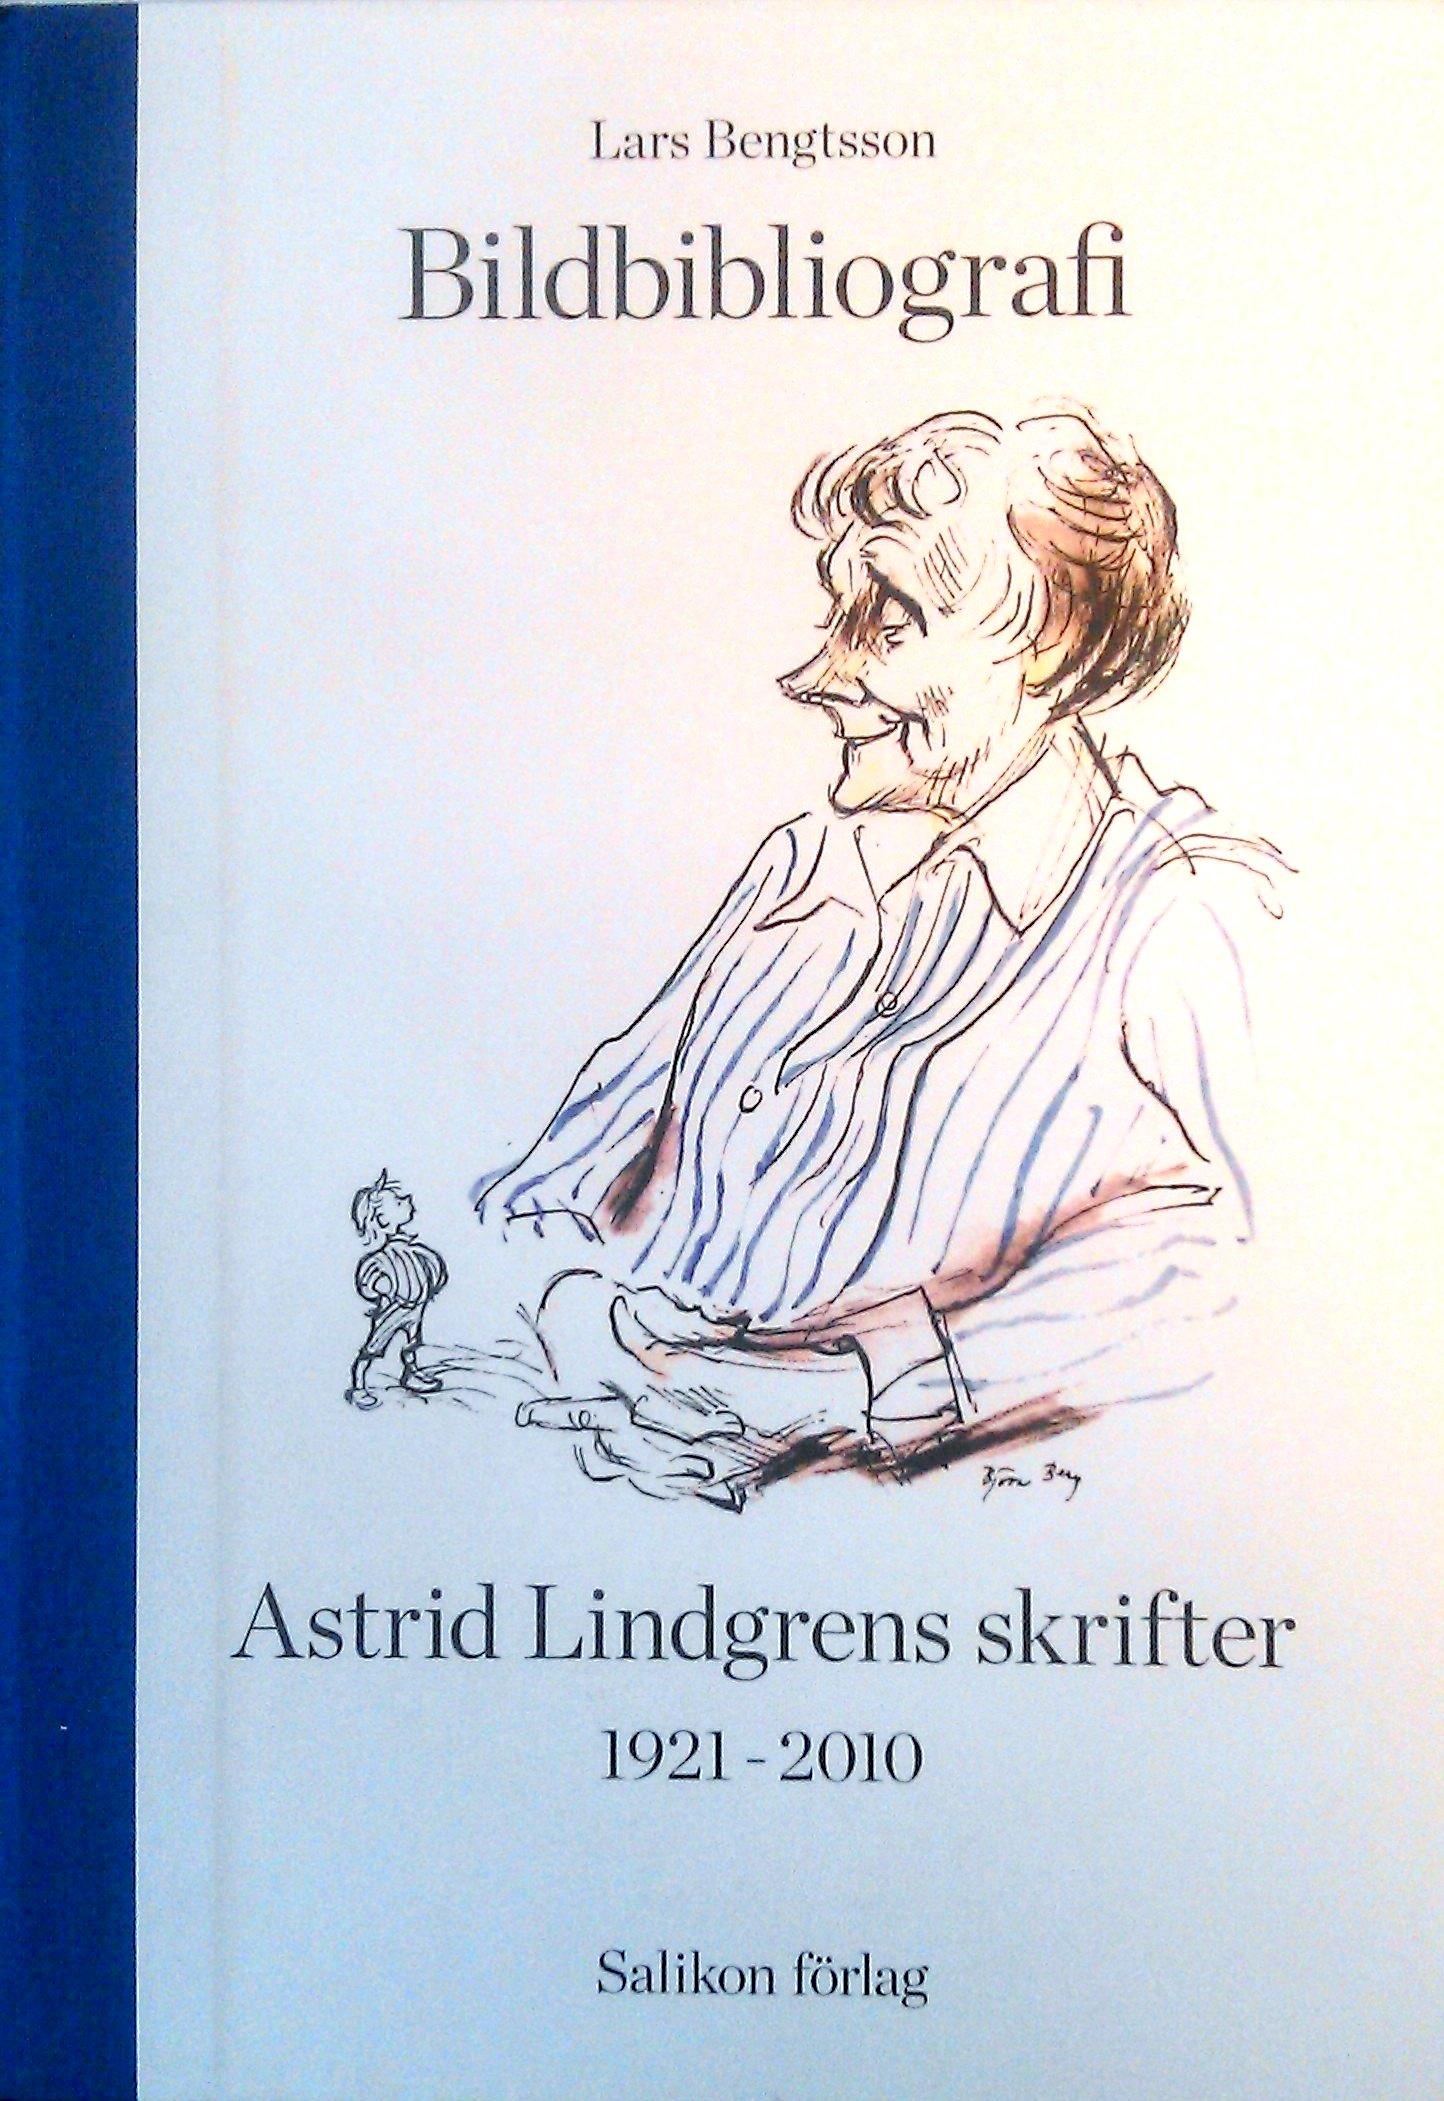 Bildbibliografi - Astrid Lindgrens skrifter 1921-2010